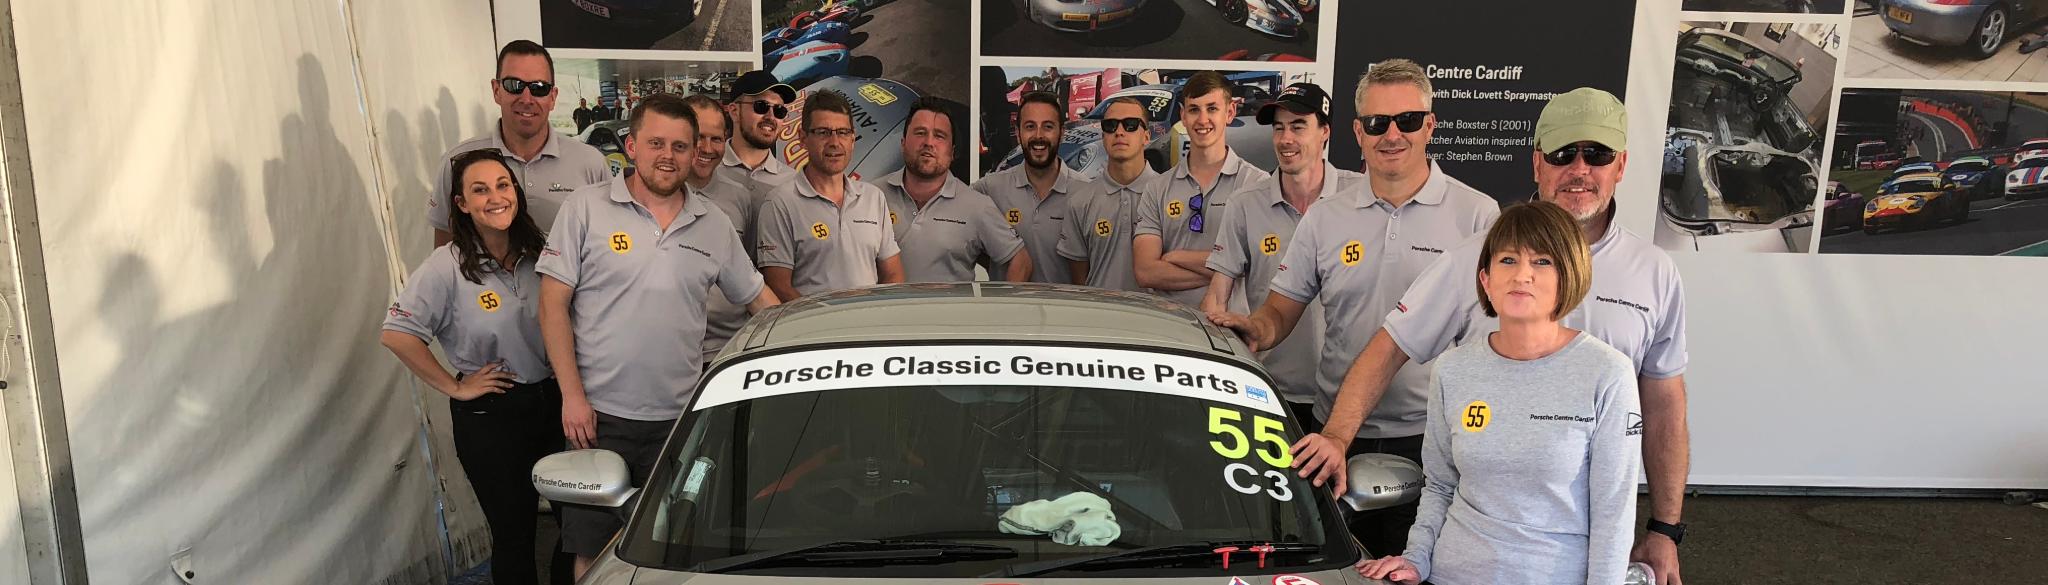 Dick Lovett Porsche Centre Cardiff Restoracing Team  at Brands Hatch